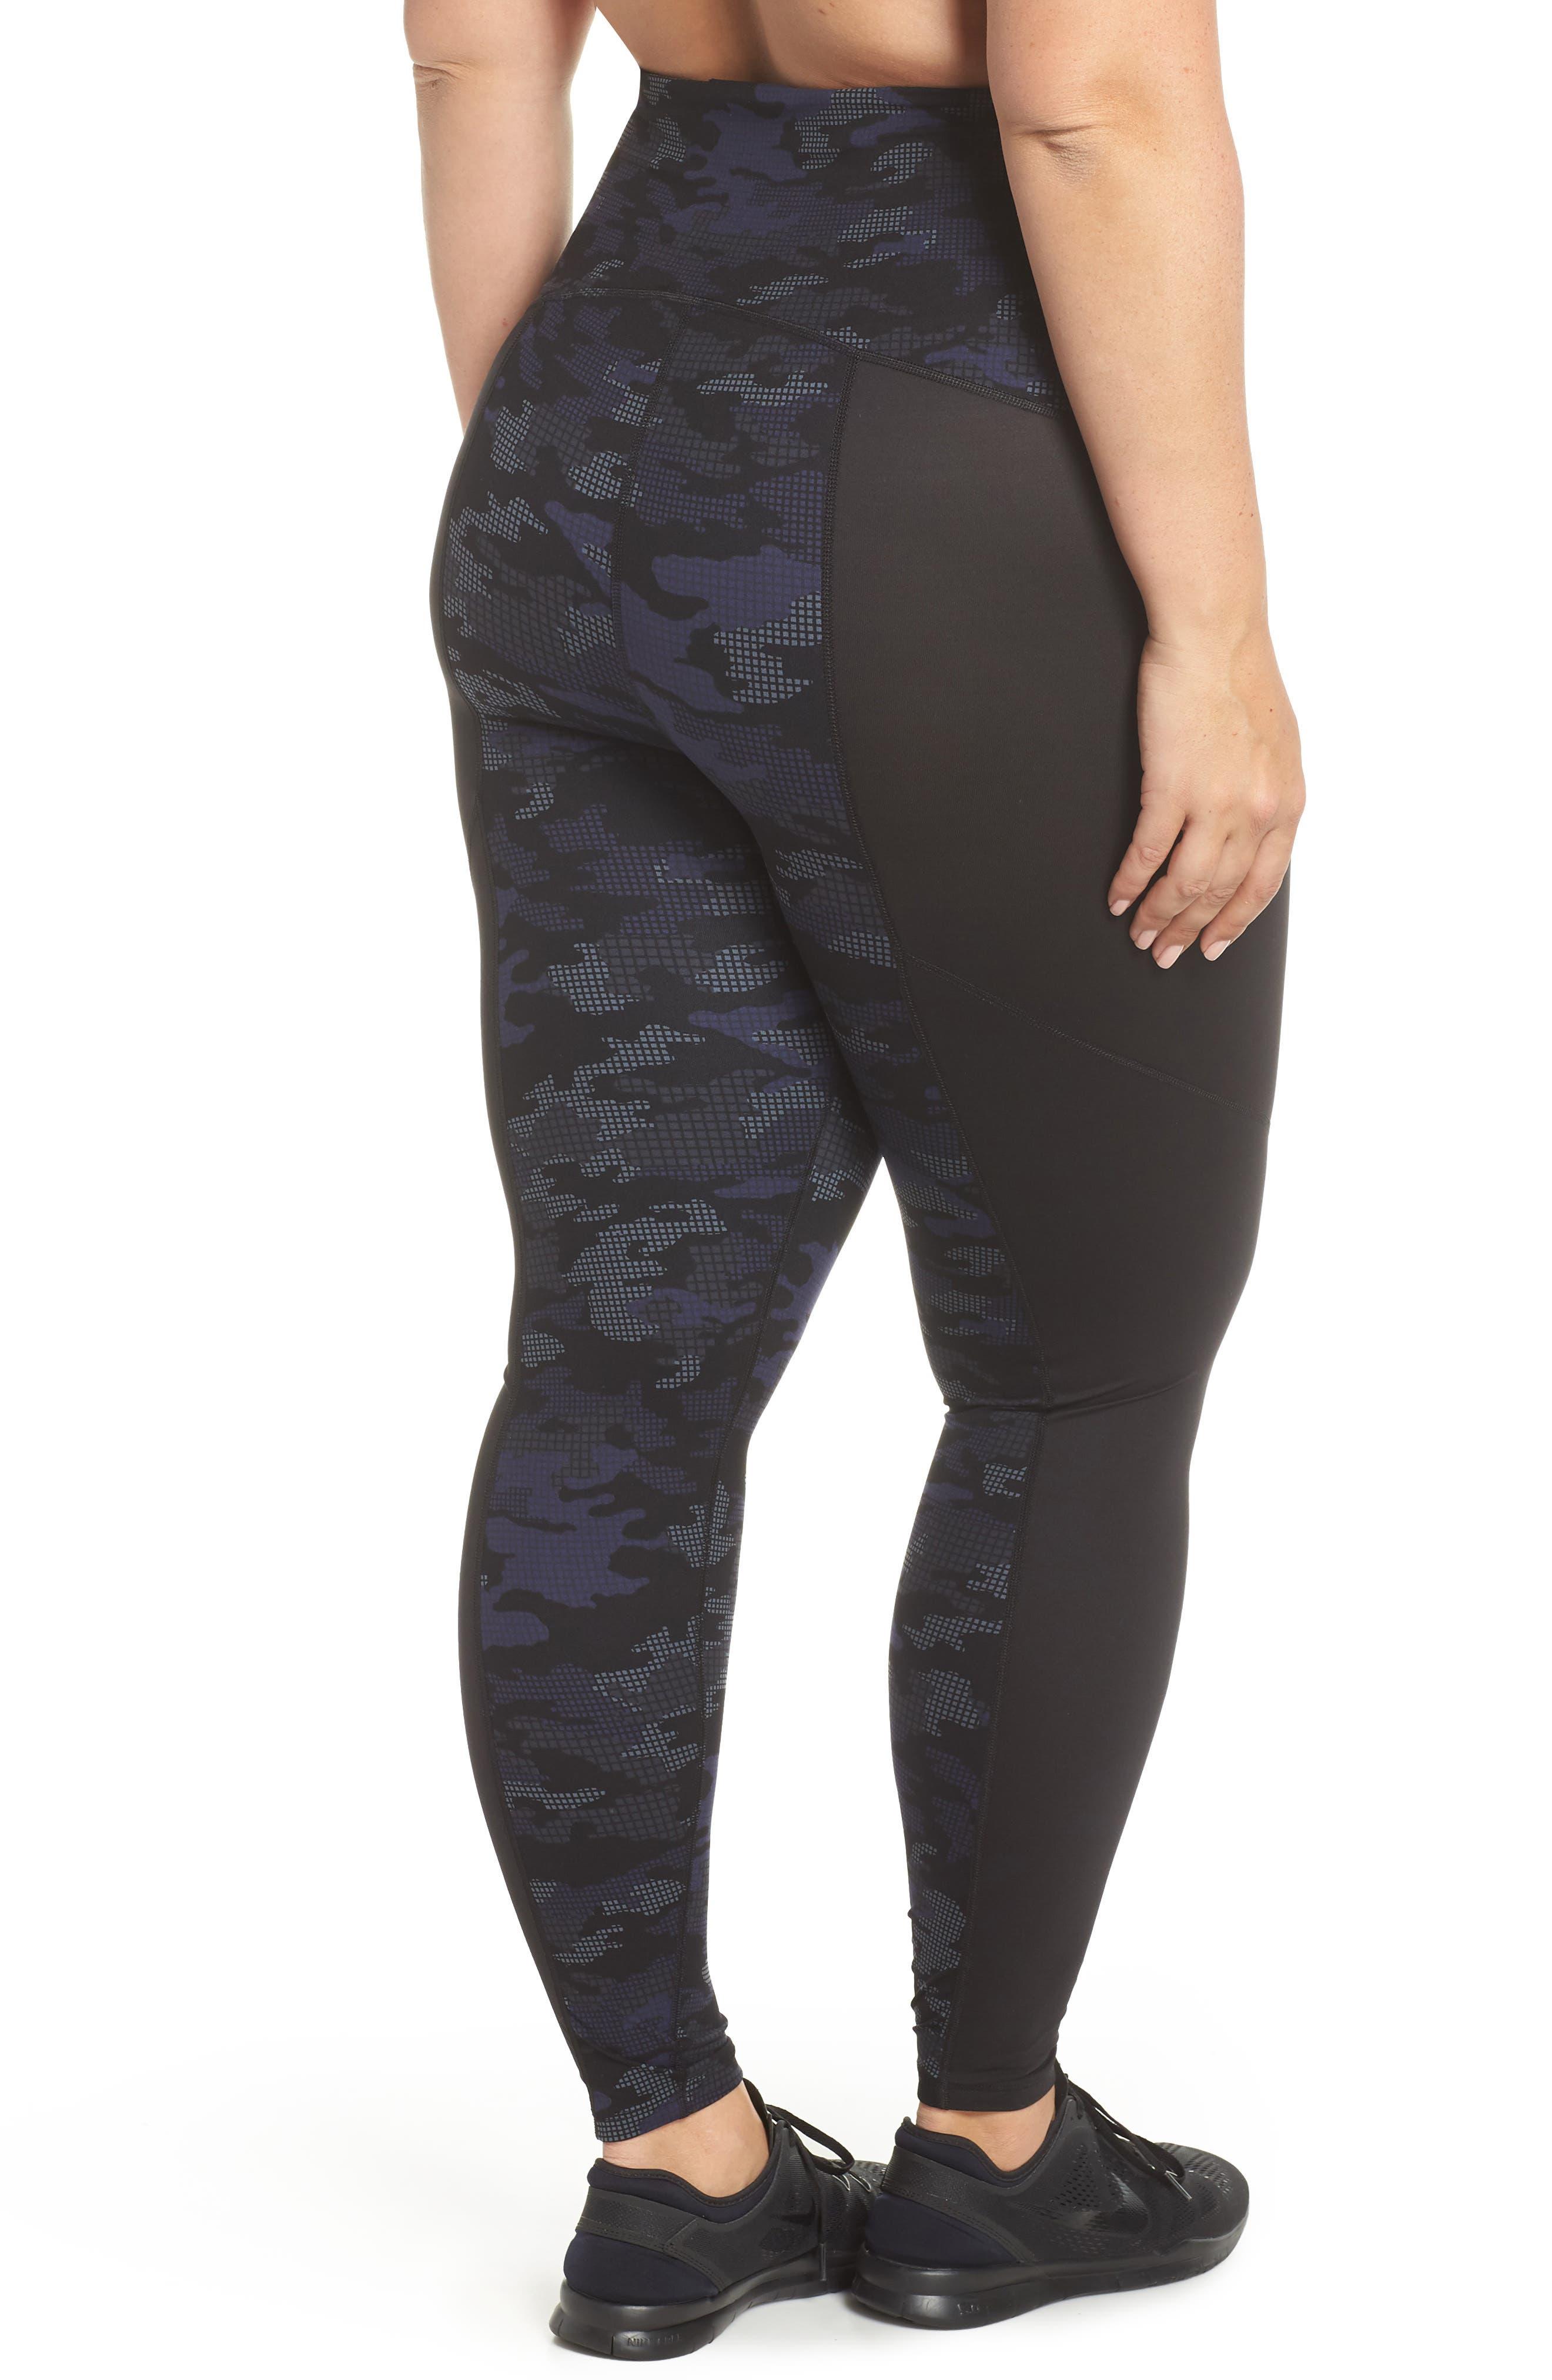 5c087527843a3 Women's SPANX® Plus-Size Pants & Leggings   Nordstrom